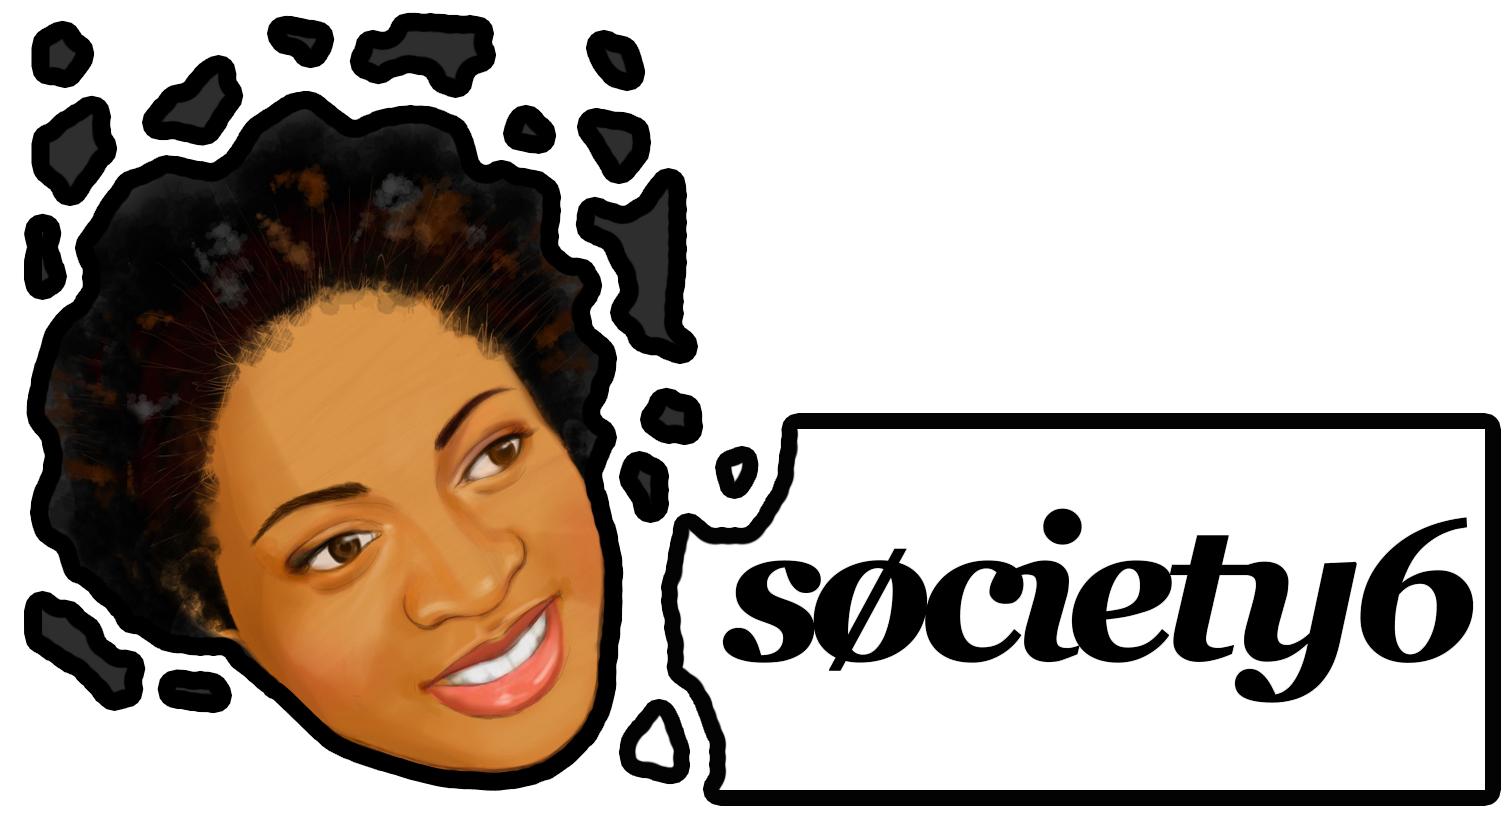 dj-sketch_society6